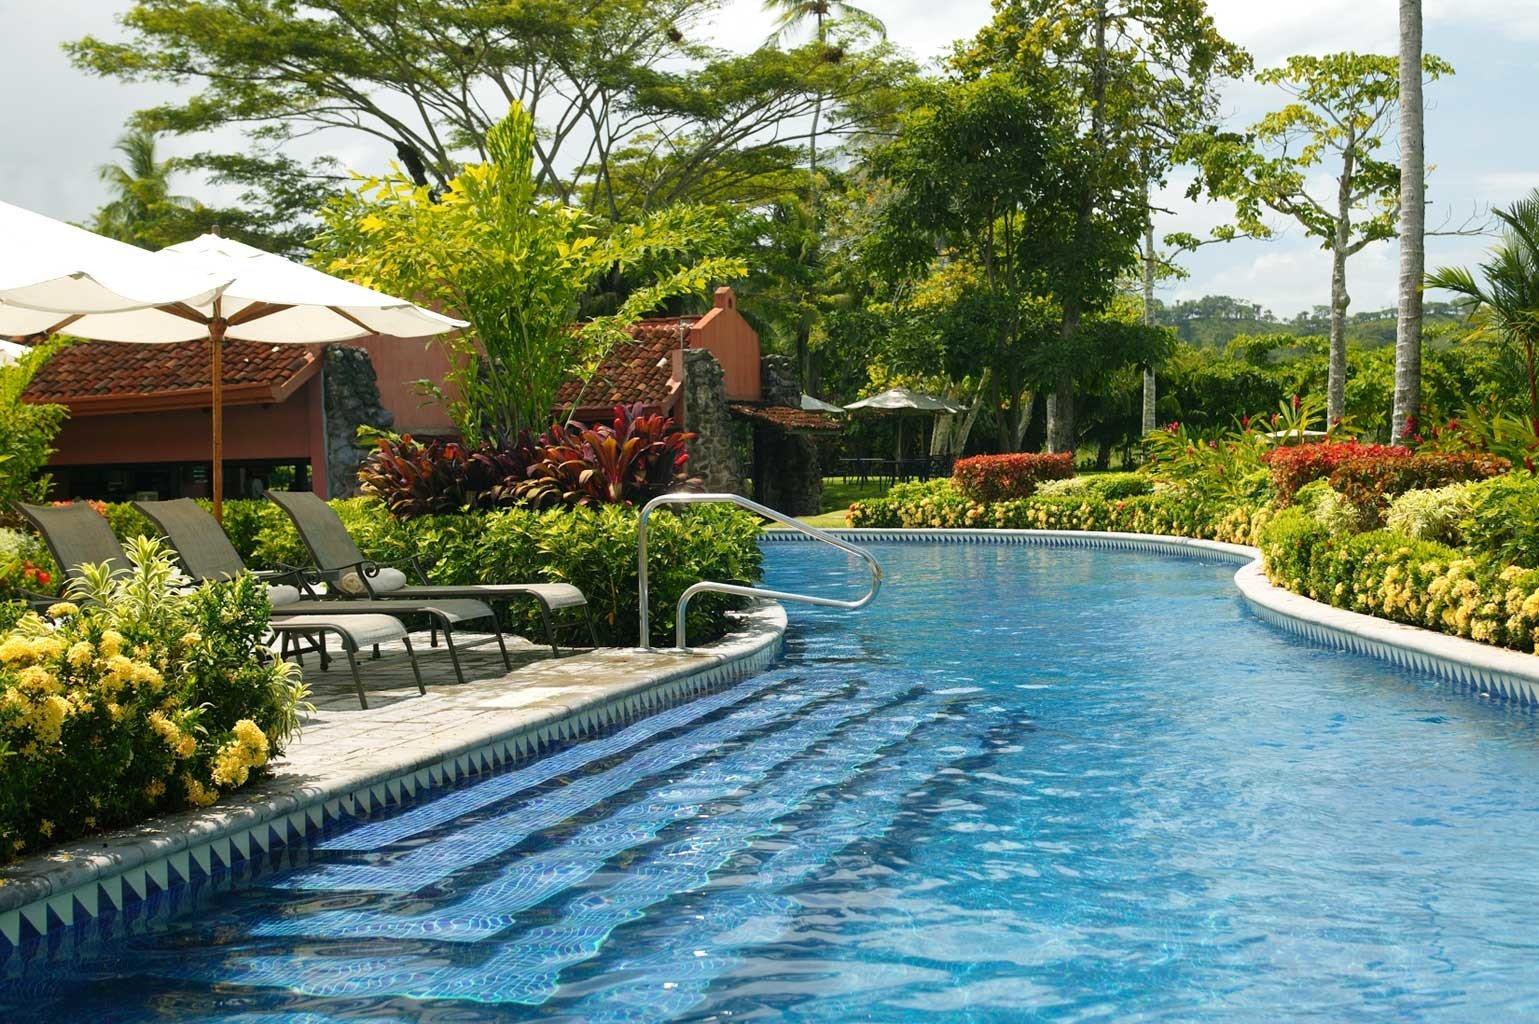 Grounds Modern Pool tree swimming pool property leisure Resort backyard Villa Garden surrounded